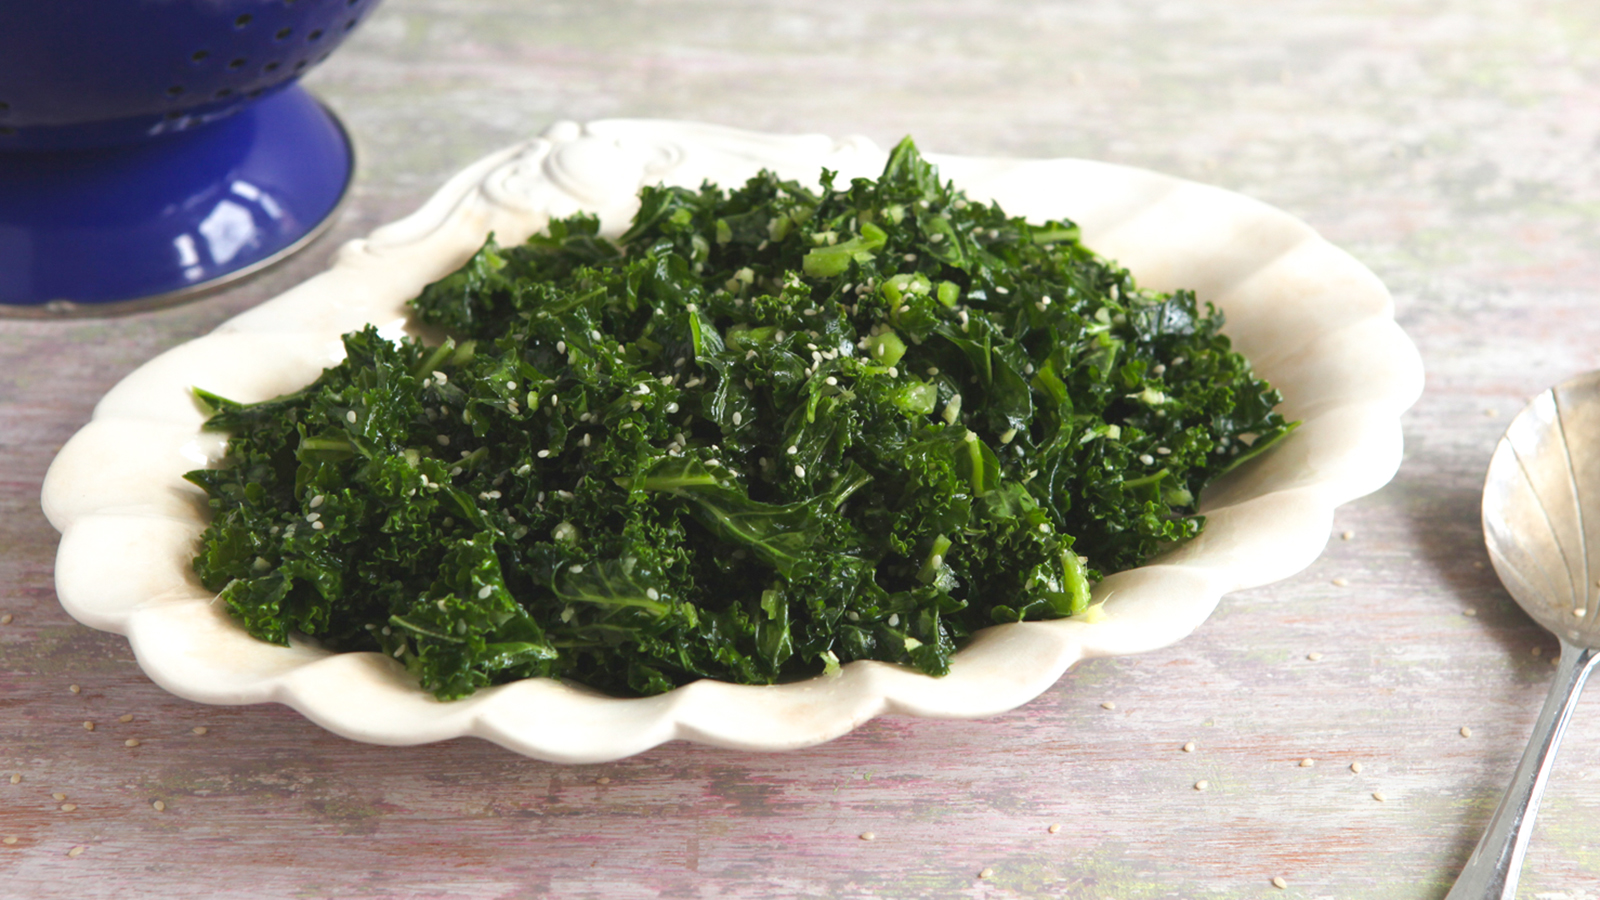 Kale lemon honey and sesame seed salad recipe bbc food forumfinder Gallery